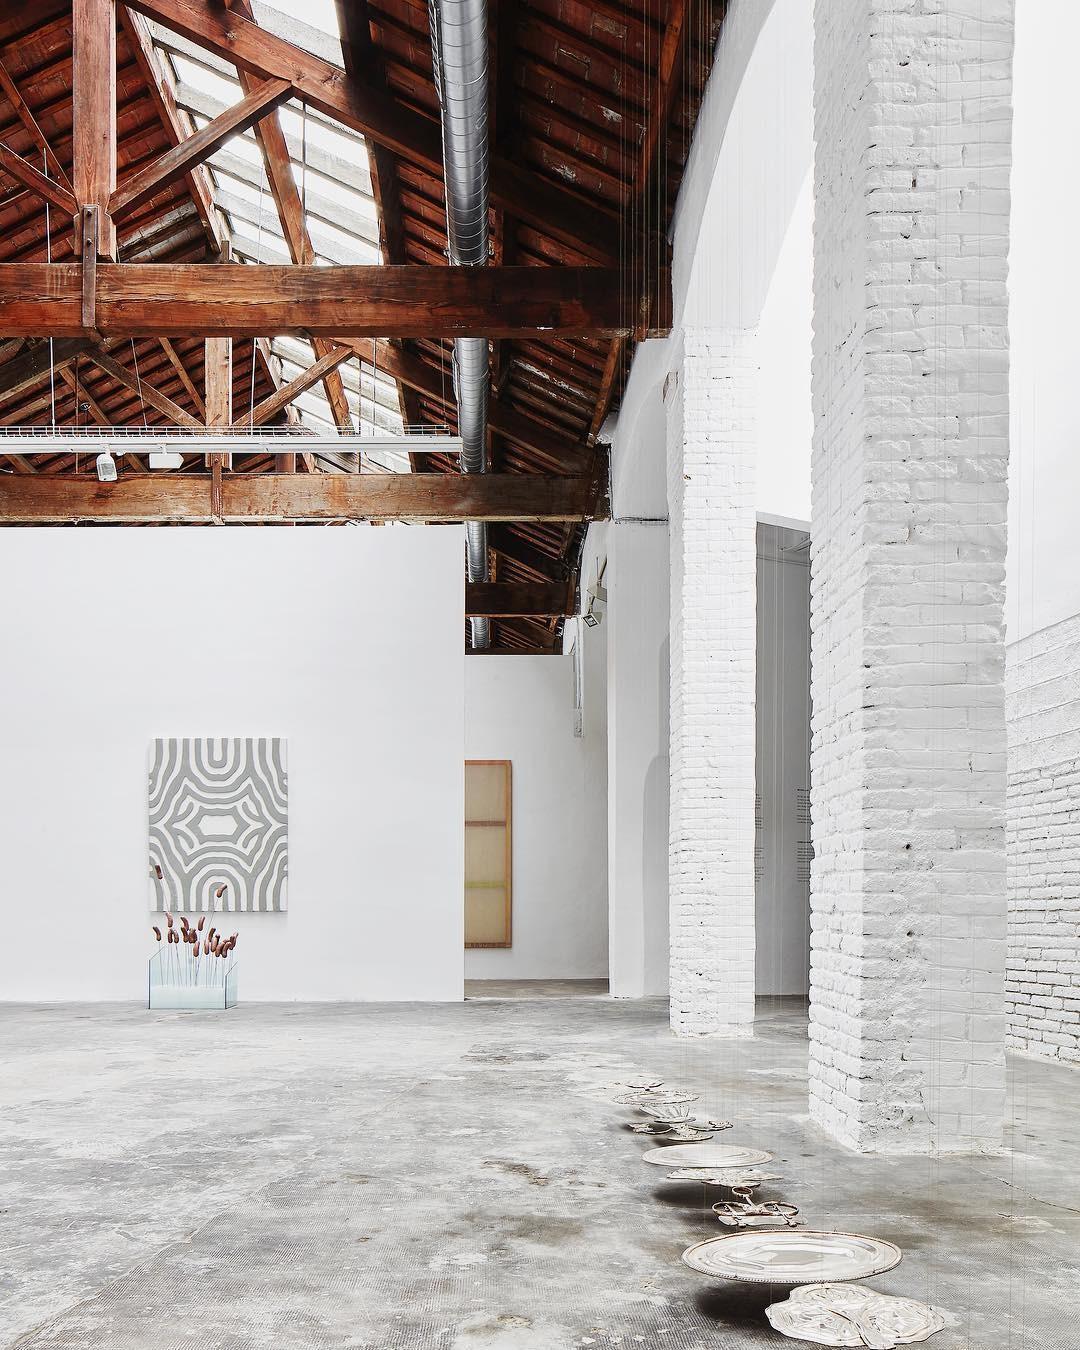 Jorge Vidal: Un estudio de arquitectura que crea proyectos poderosos desde Barcelona jorge vidal Jorge Vidal: Un estudio de arquitectura que crea proyectos poderosos desde Barcelona 56285382 437871886950248 444594610644239445 n